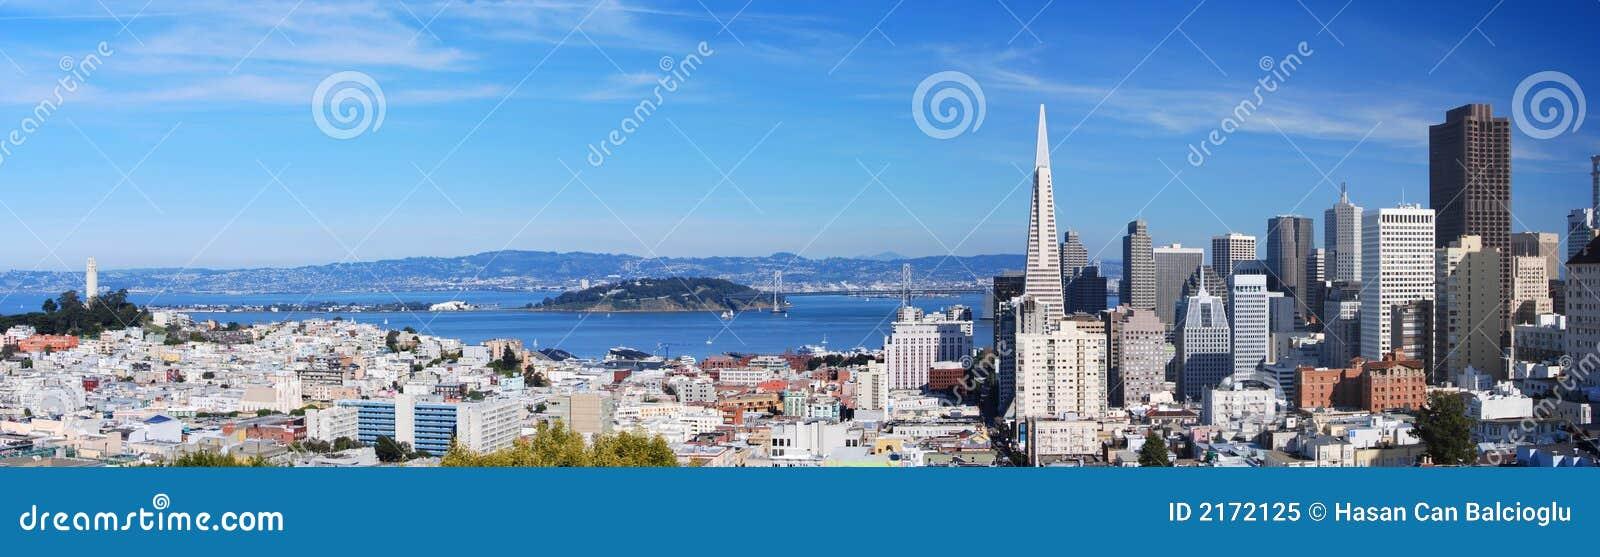 7 panorama San Francisco